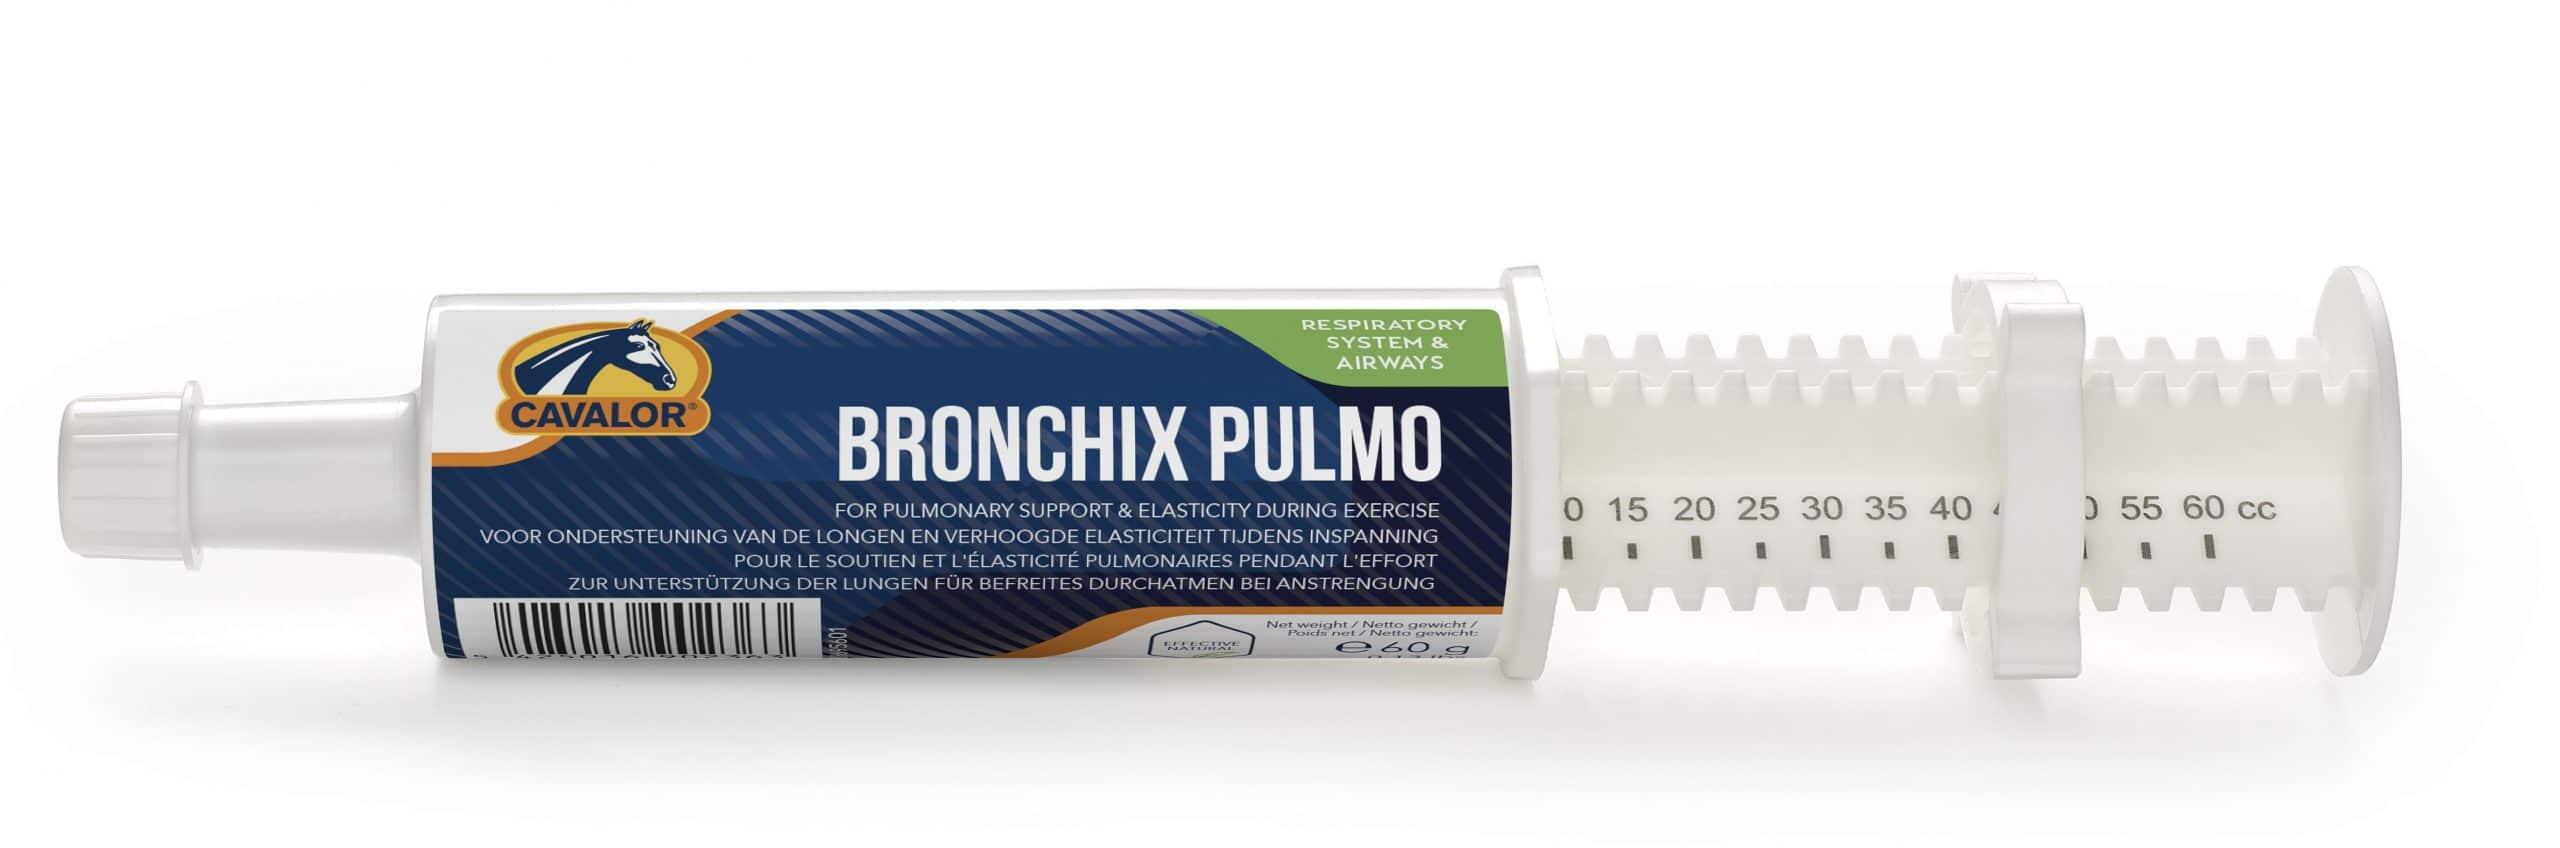 Bronchix